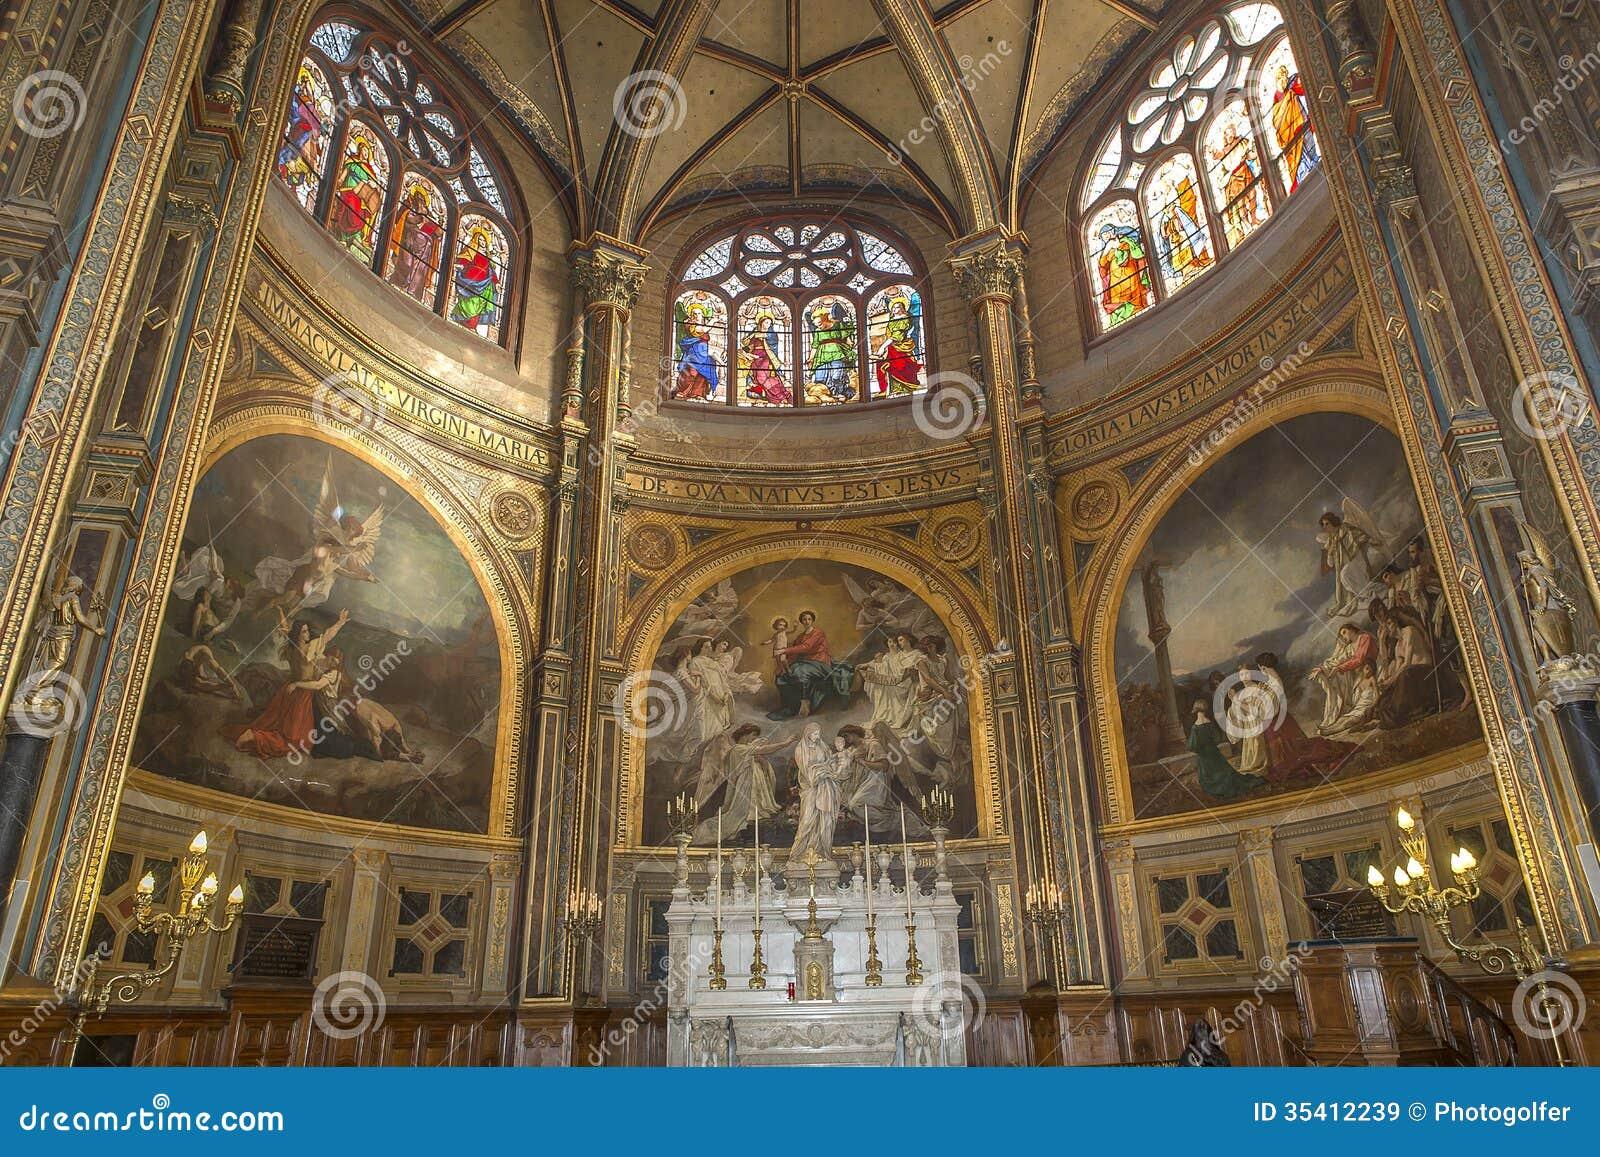 Interiors of saint eustache church paris france stock for Domon saint eustache